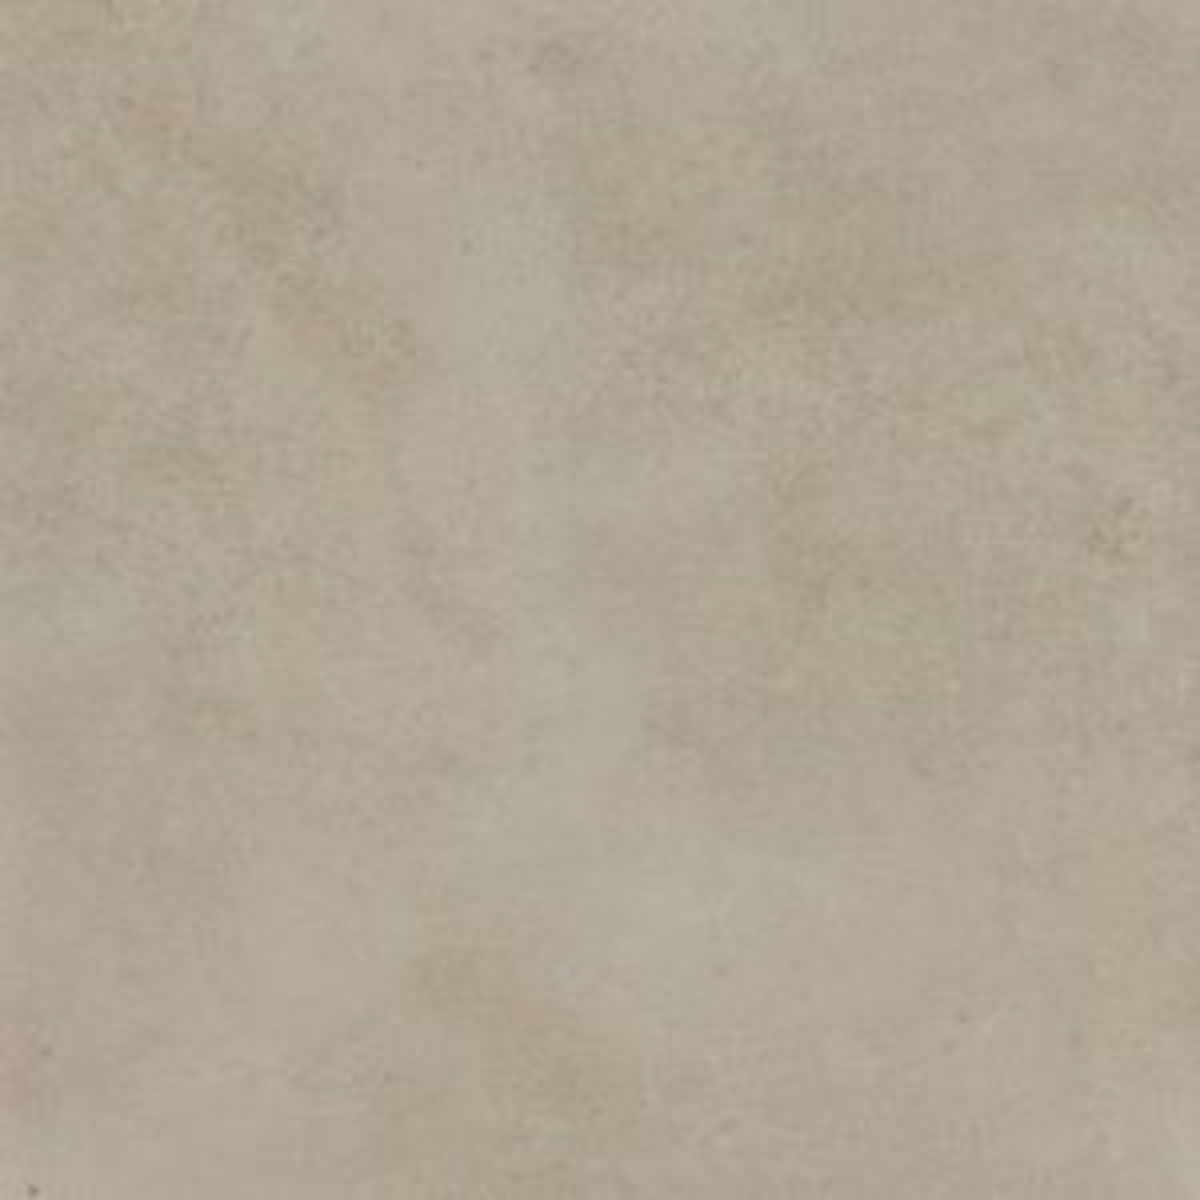 RAK Surface Light Sand Lappato Tile 600 x 600mm